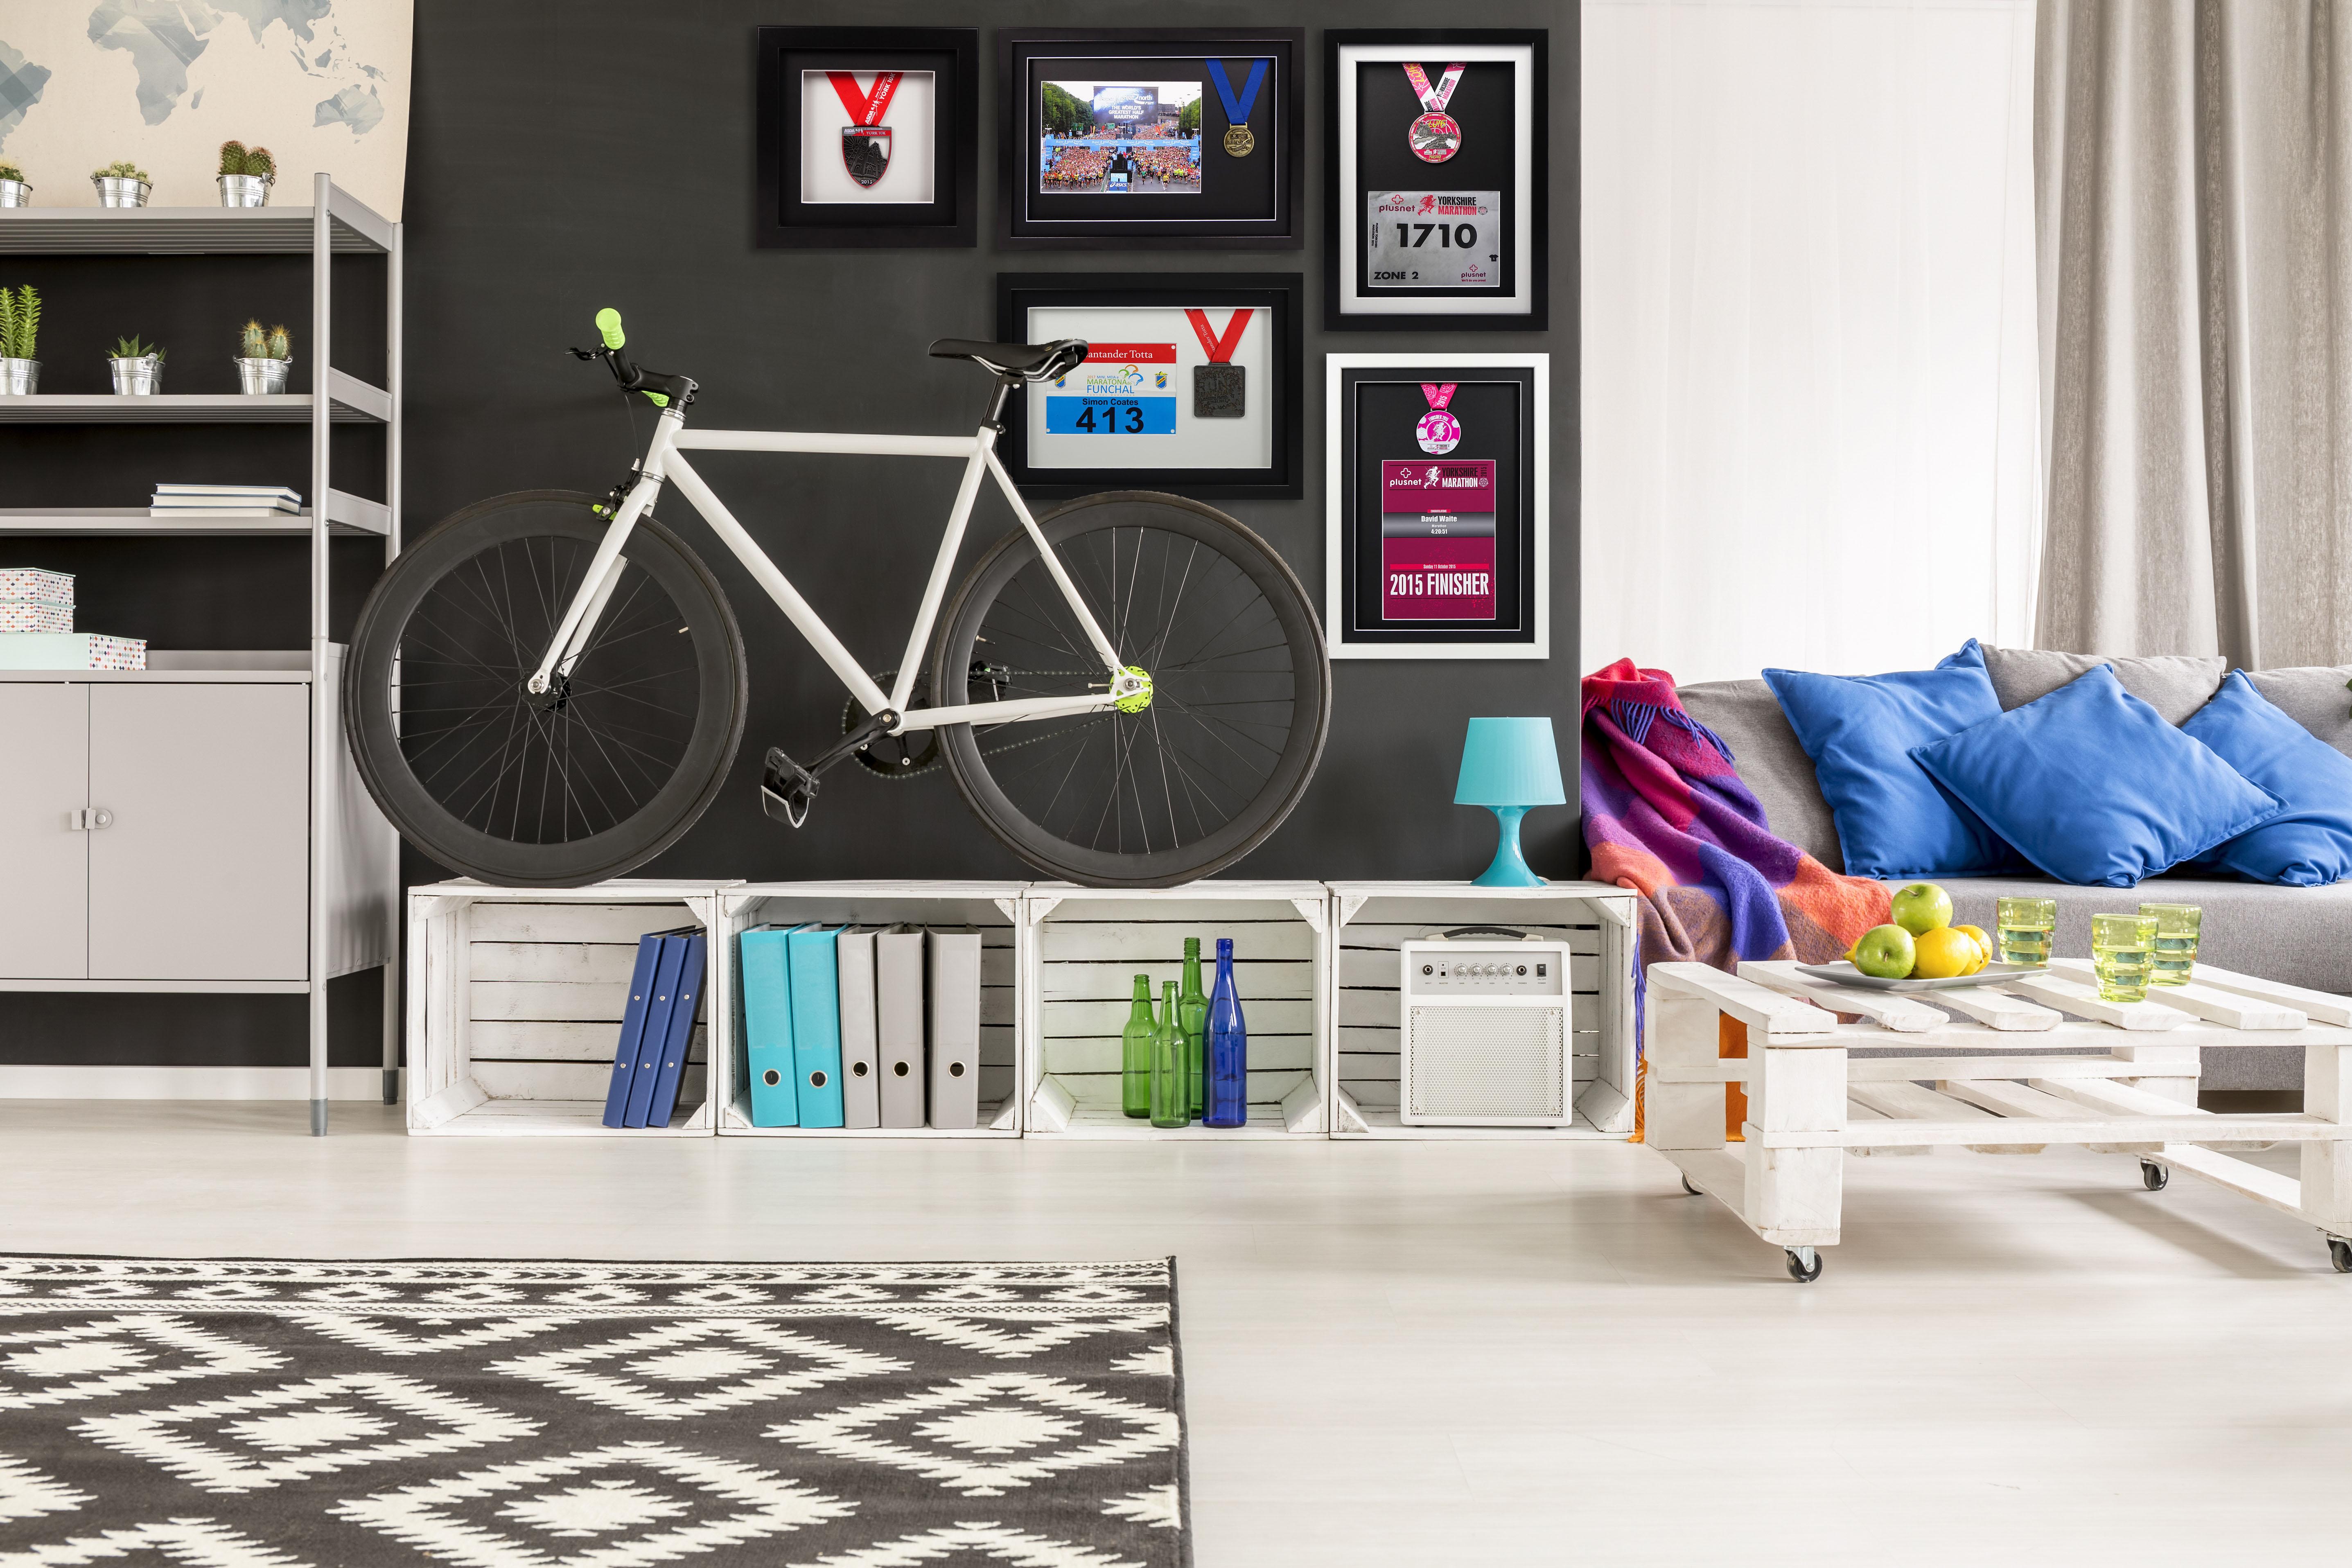 entr e lumi re. Black Bedroom Furniture Sets. Home Design Ideas